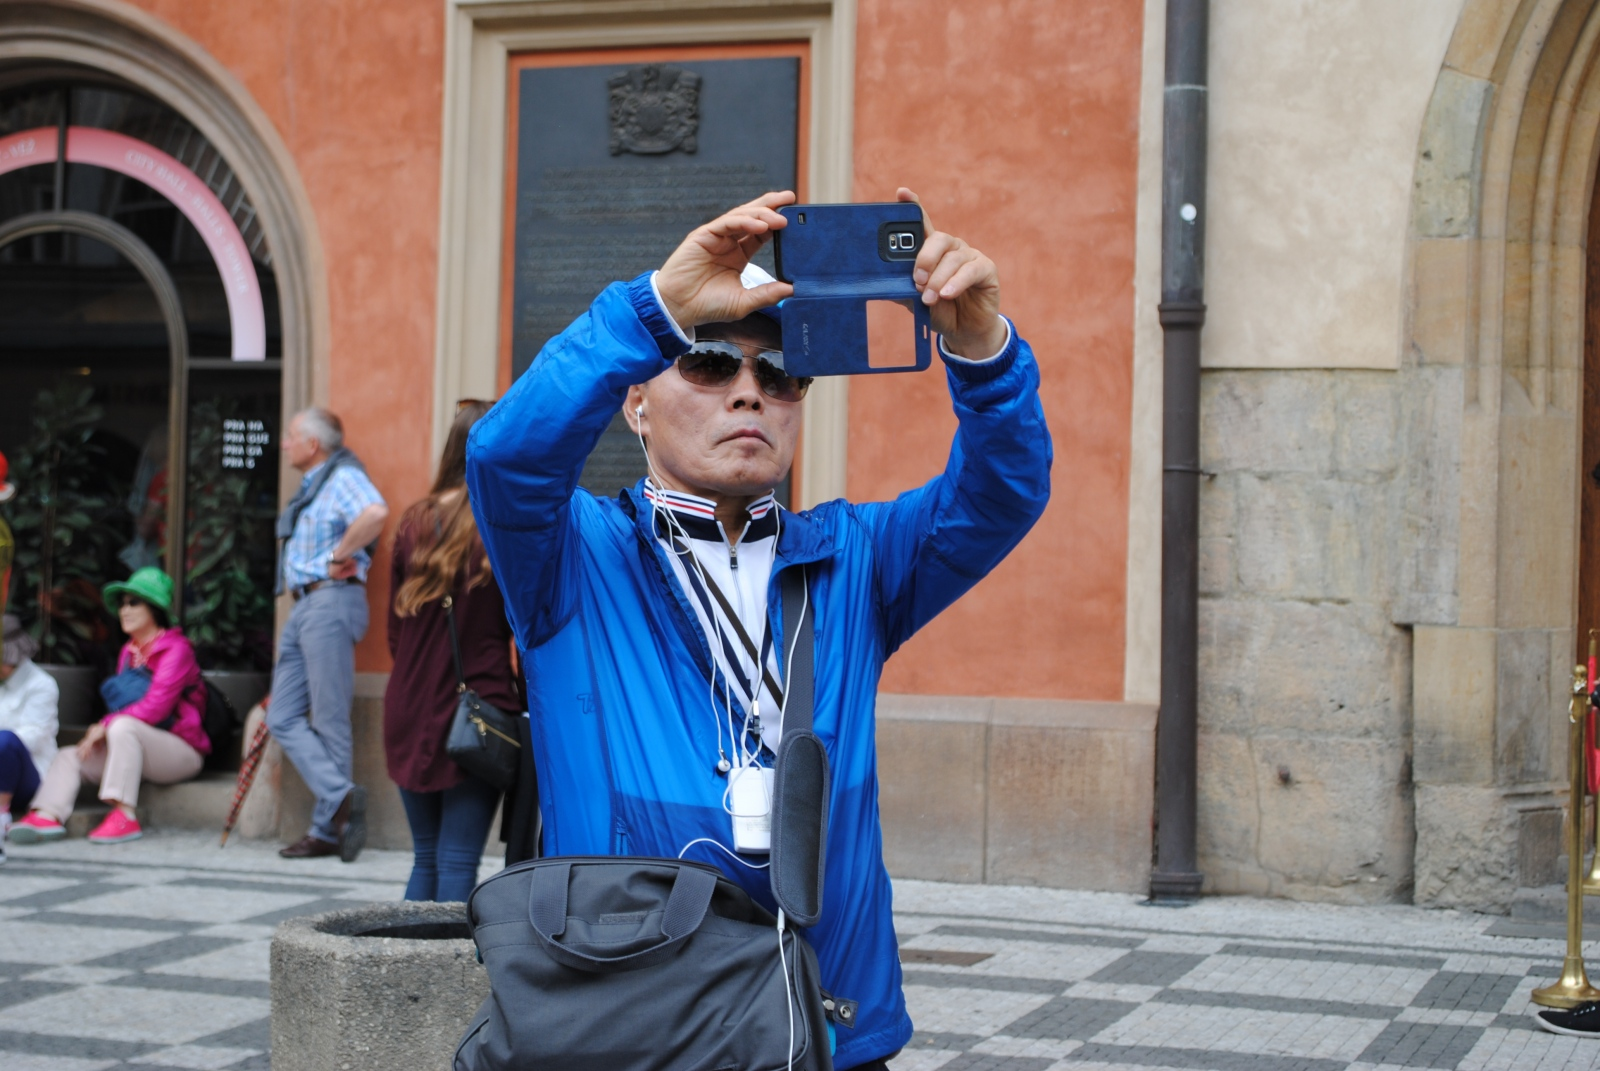 Art and Documentary Photography - Loading DSC_0187.JPG